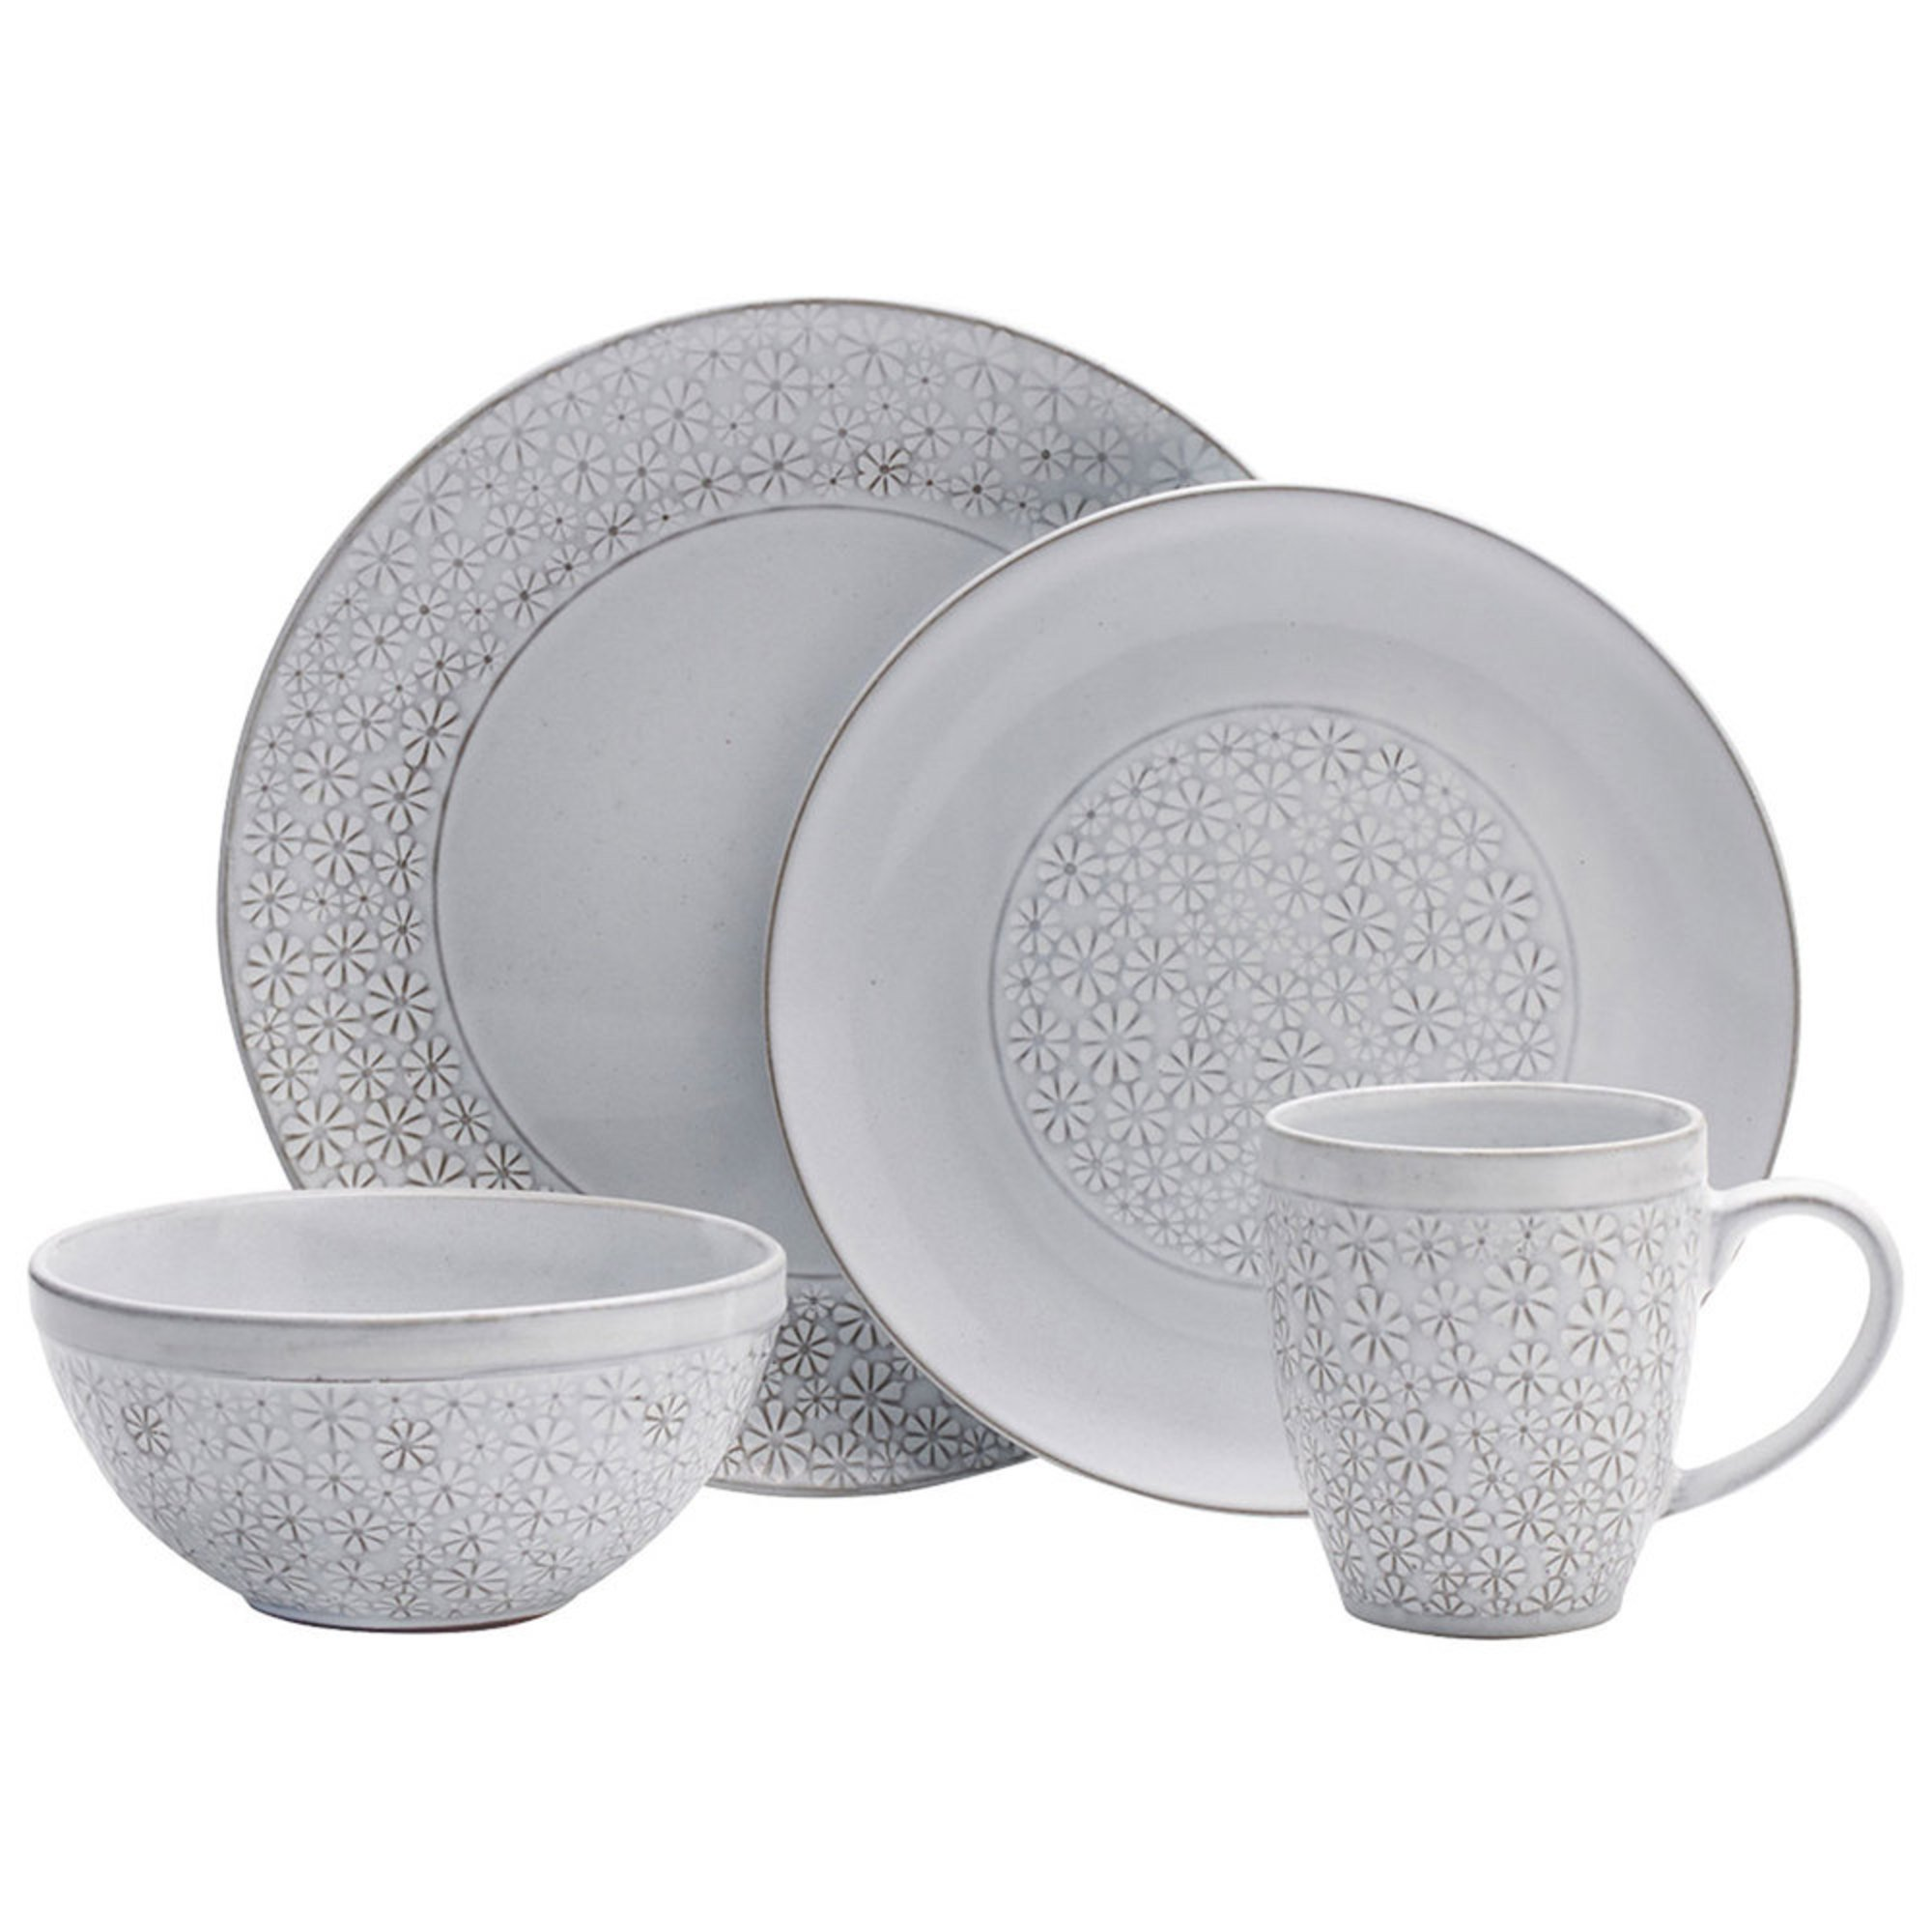 Pfaltzgraff 16 Piece Blossom White Dinnerware Set Dinnerware Sets